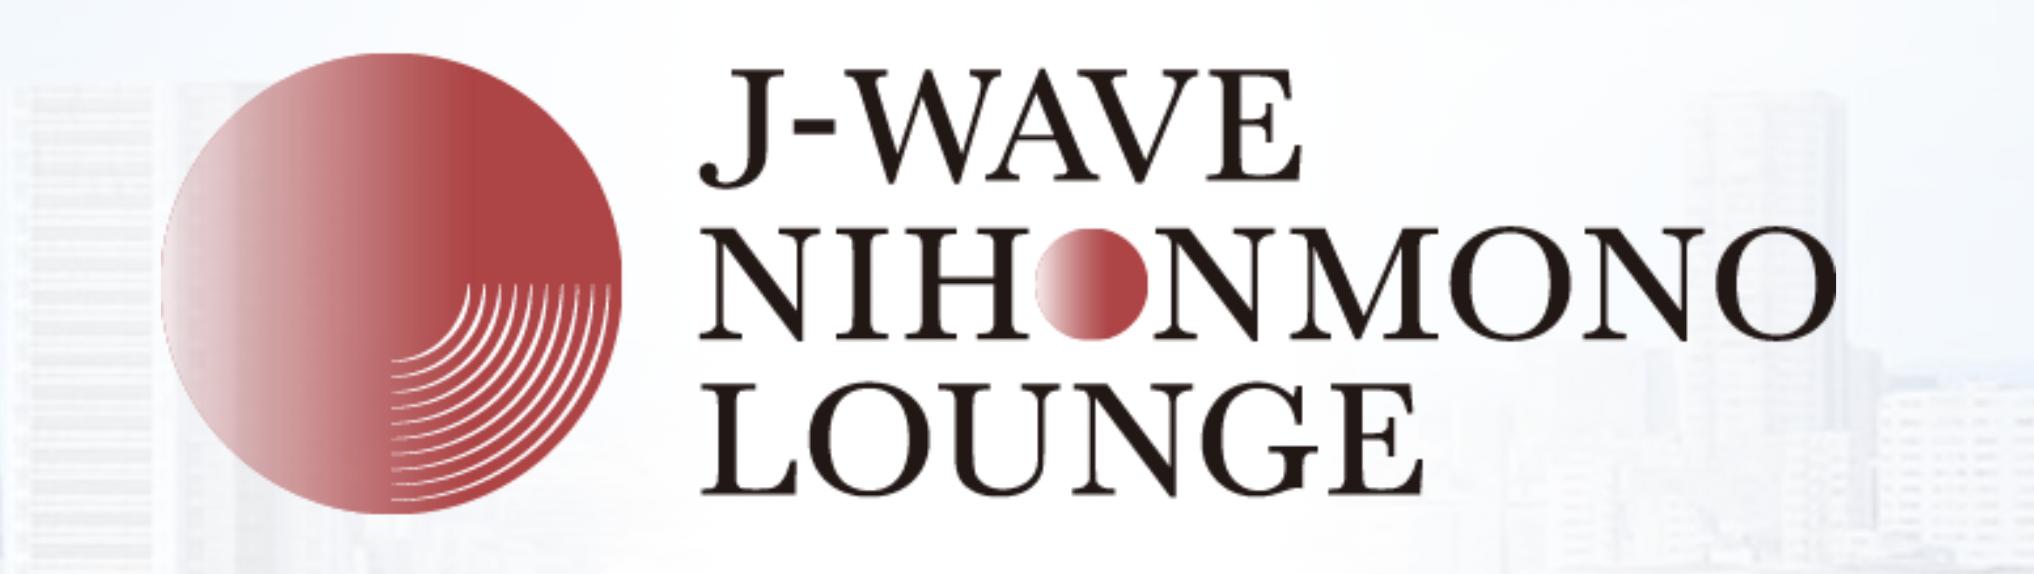 J-WAVE『YEBISU BEER BEGINNINGS~FROM TAKANAWA GATEWAY』公開生放送に名渡山遼が出演決定!